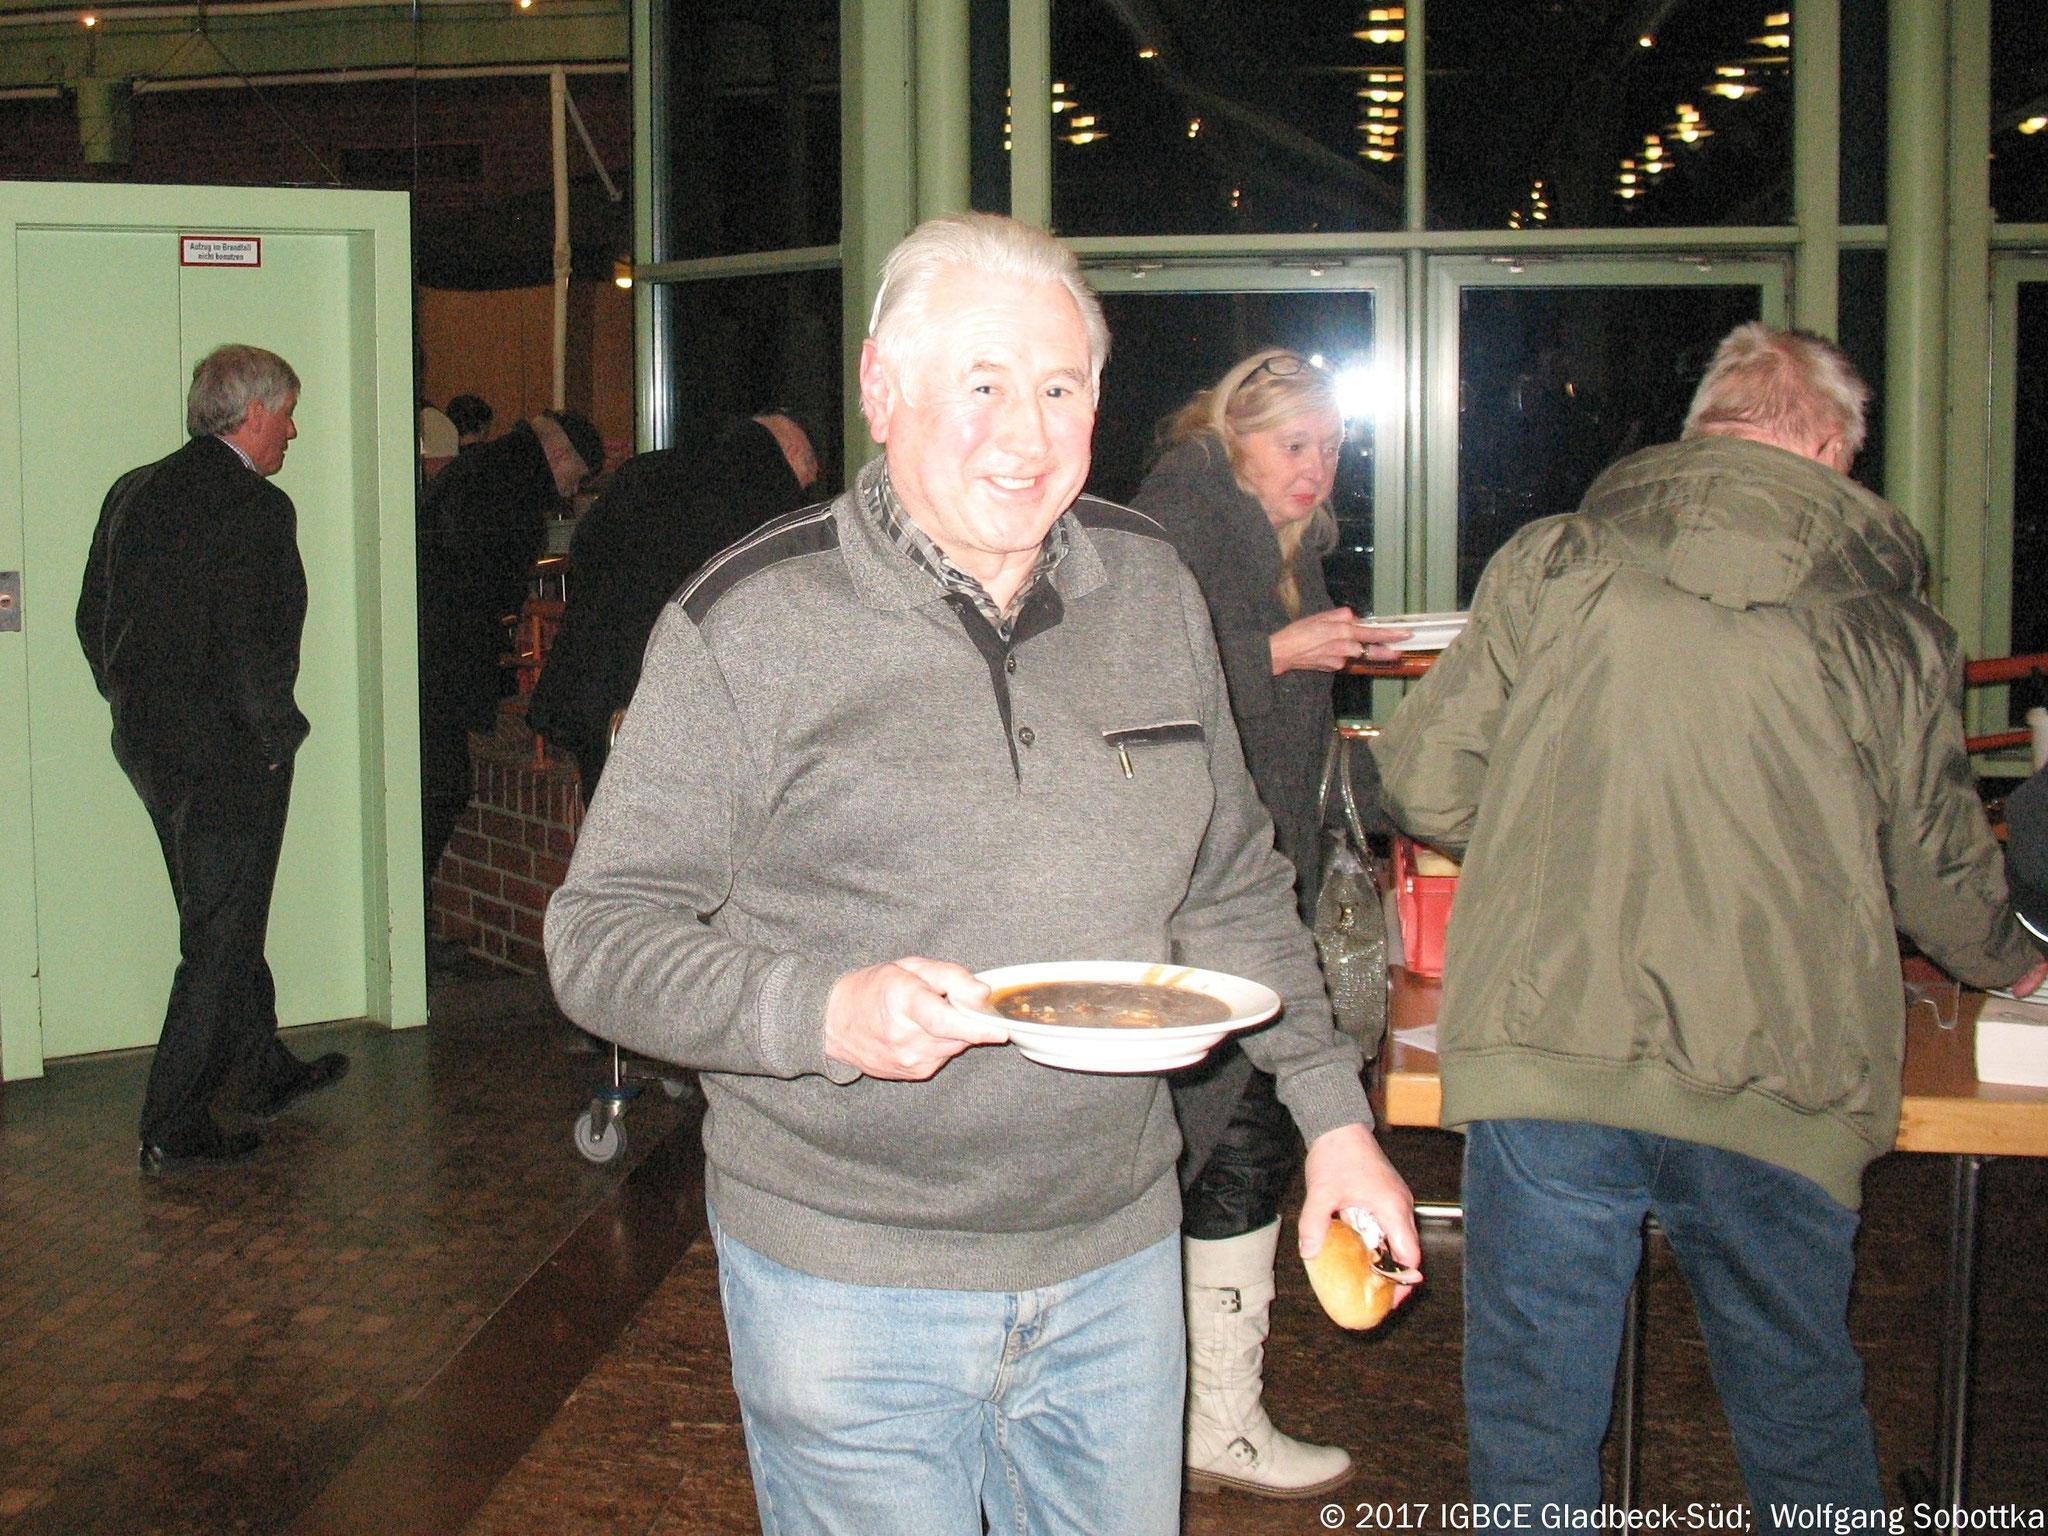 DGB Neujahrsempfang 2017 in Gladbeck, Fotos: IG BCE Gladbeck-Süd Wolfgang Sobottka